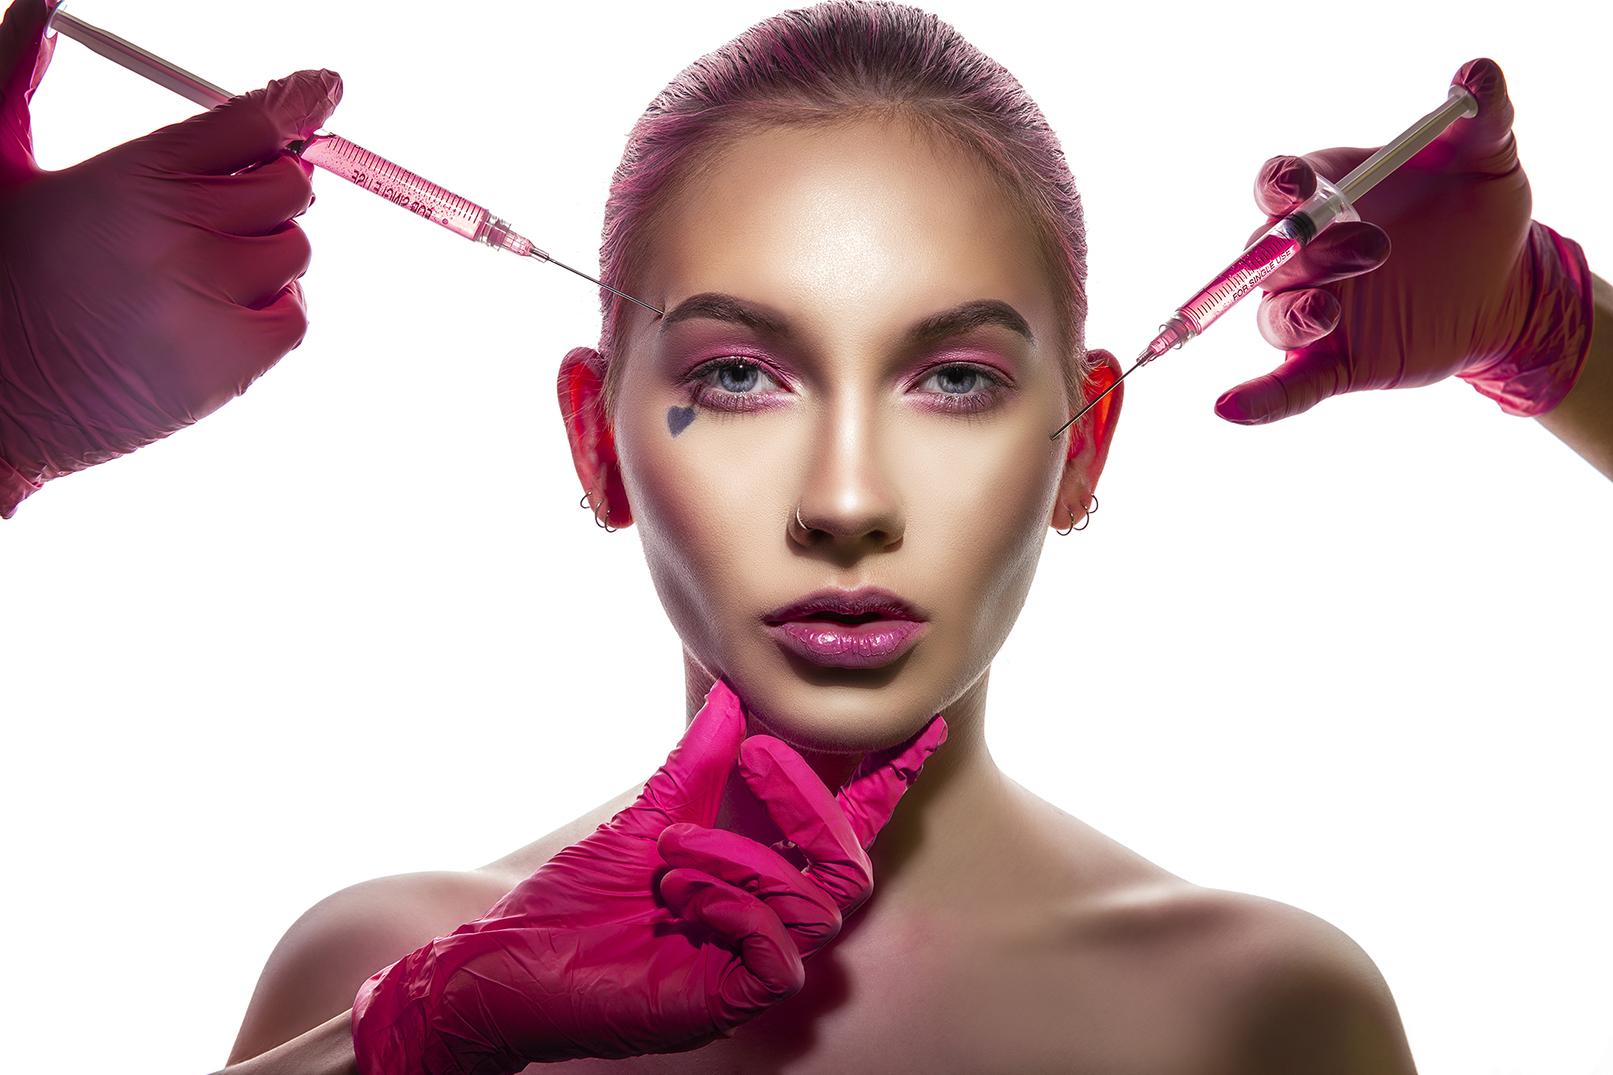 surgery-theme-beauty-photography.jpg